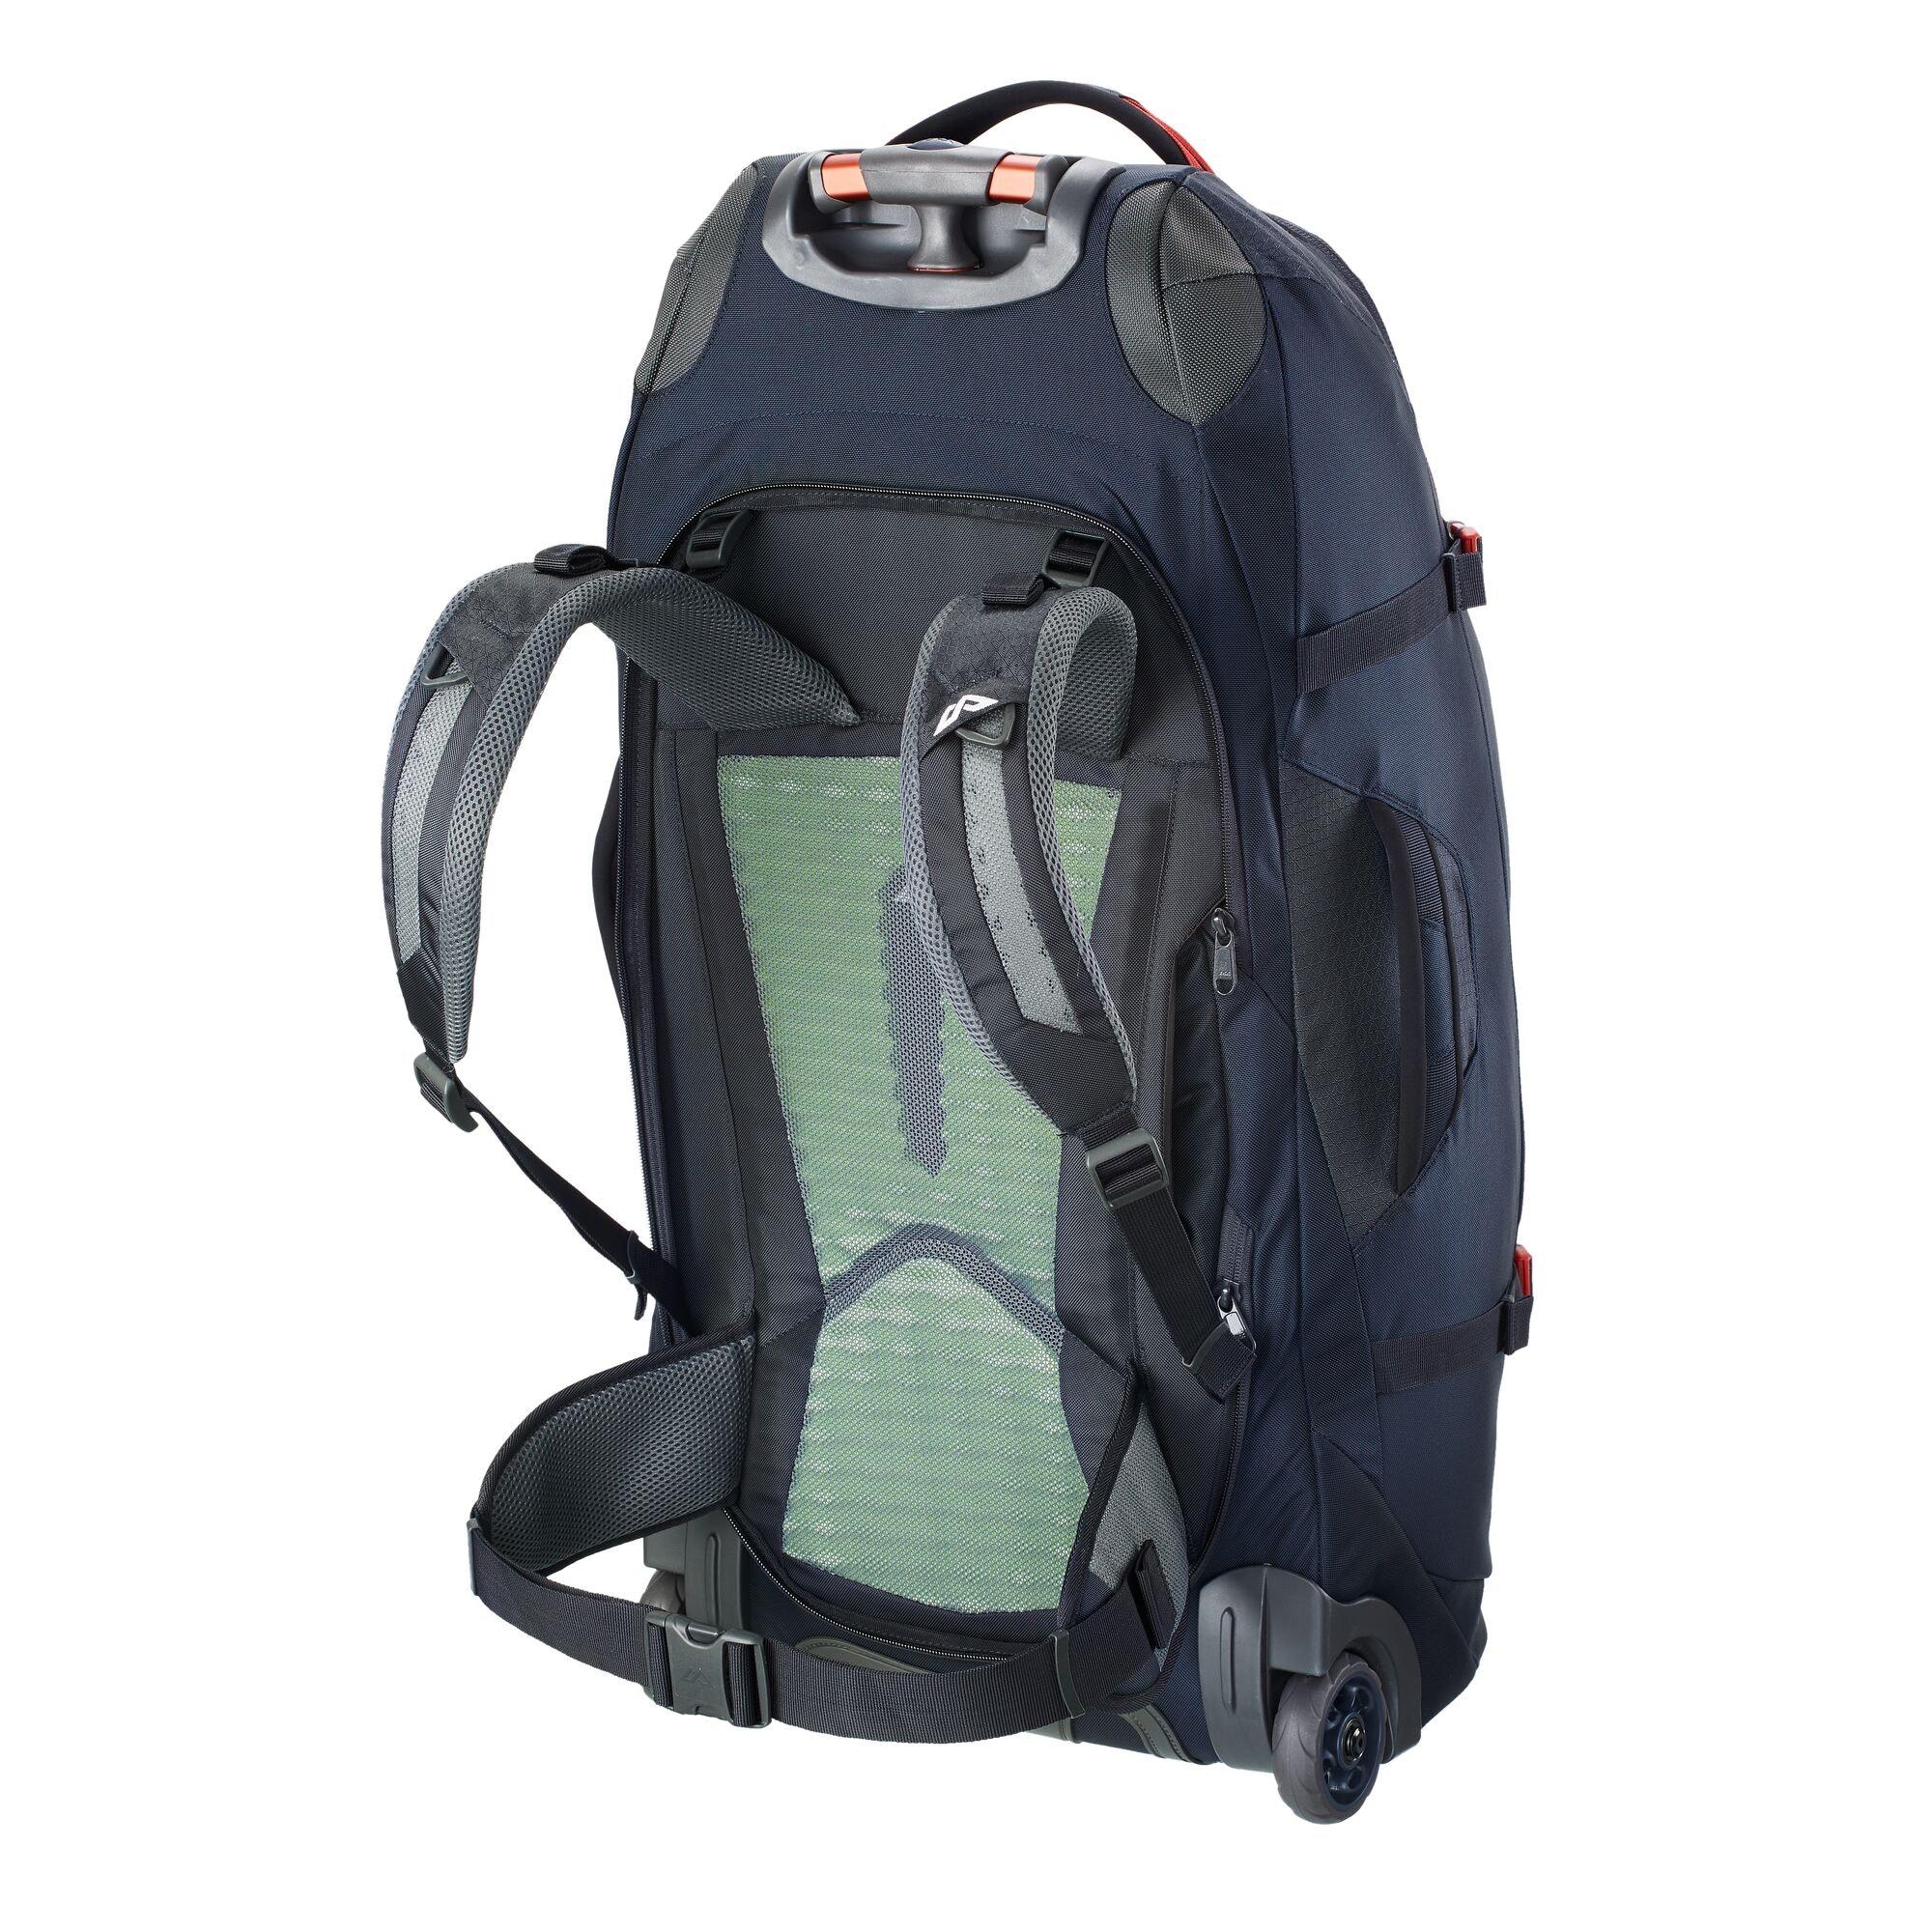 thumbnail 12 - NEW-Kathmandu-Hybrid-70L-Backpack-Wheeled-Handle-Luggage-Bag-Travel-Trolley